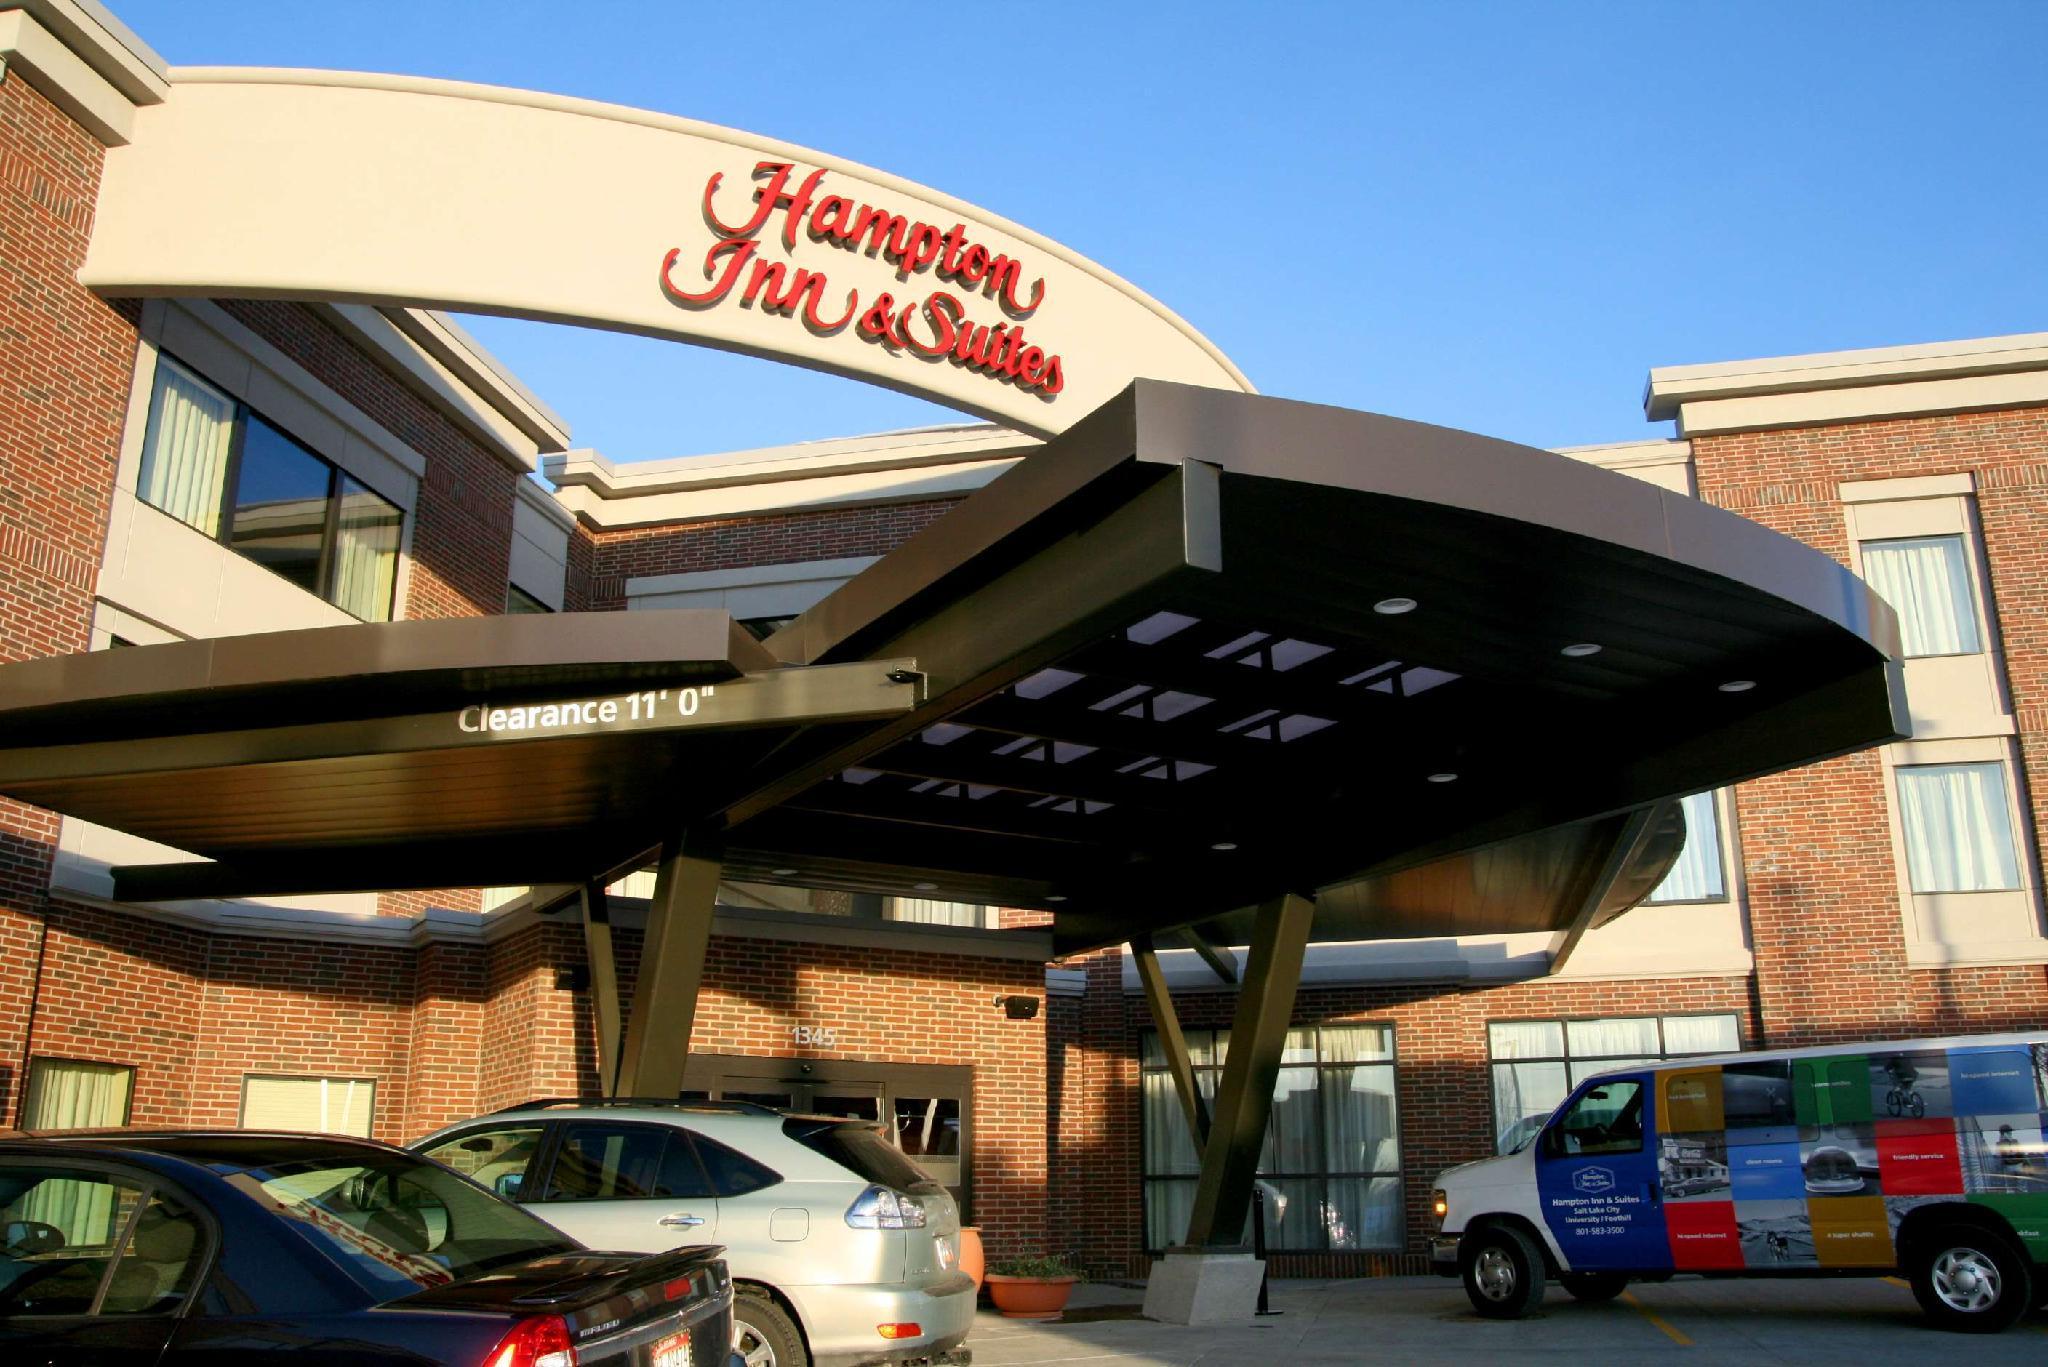 Hampton Inn And Suites Salt Lake City-Univ Foothill Dr., Salt Lake